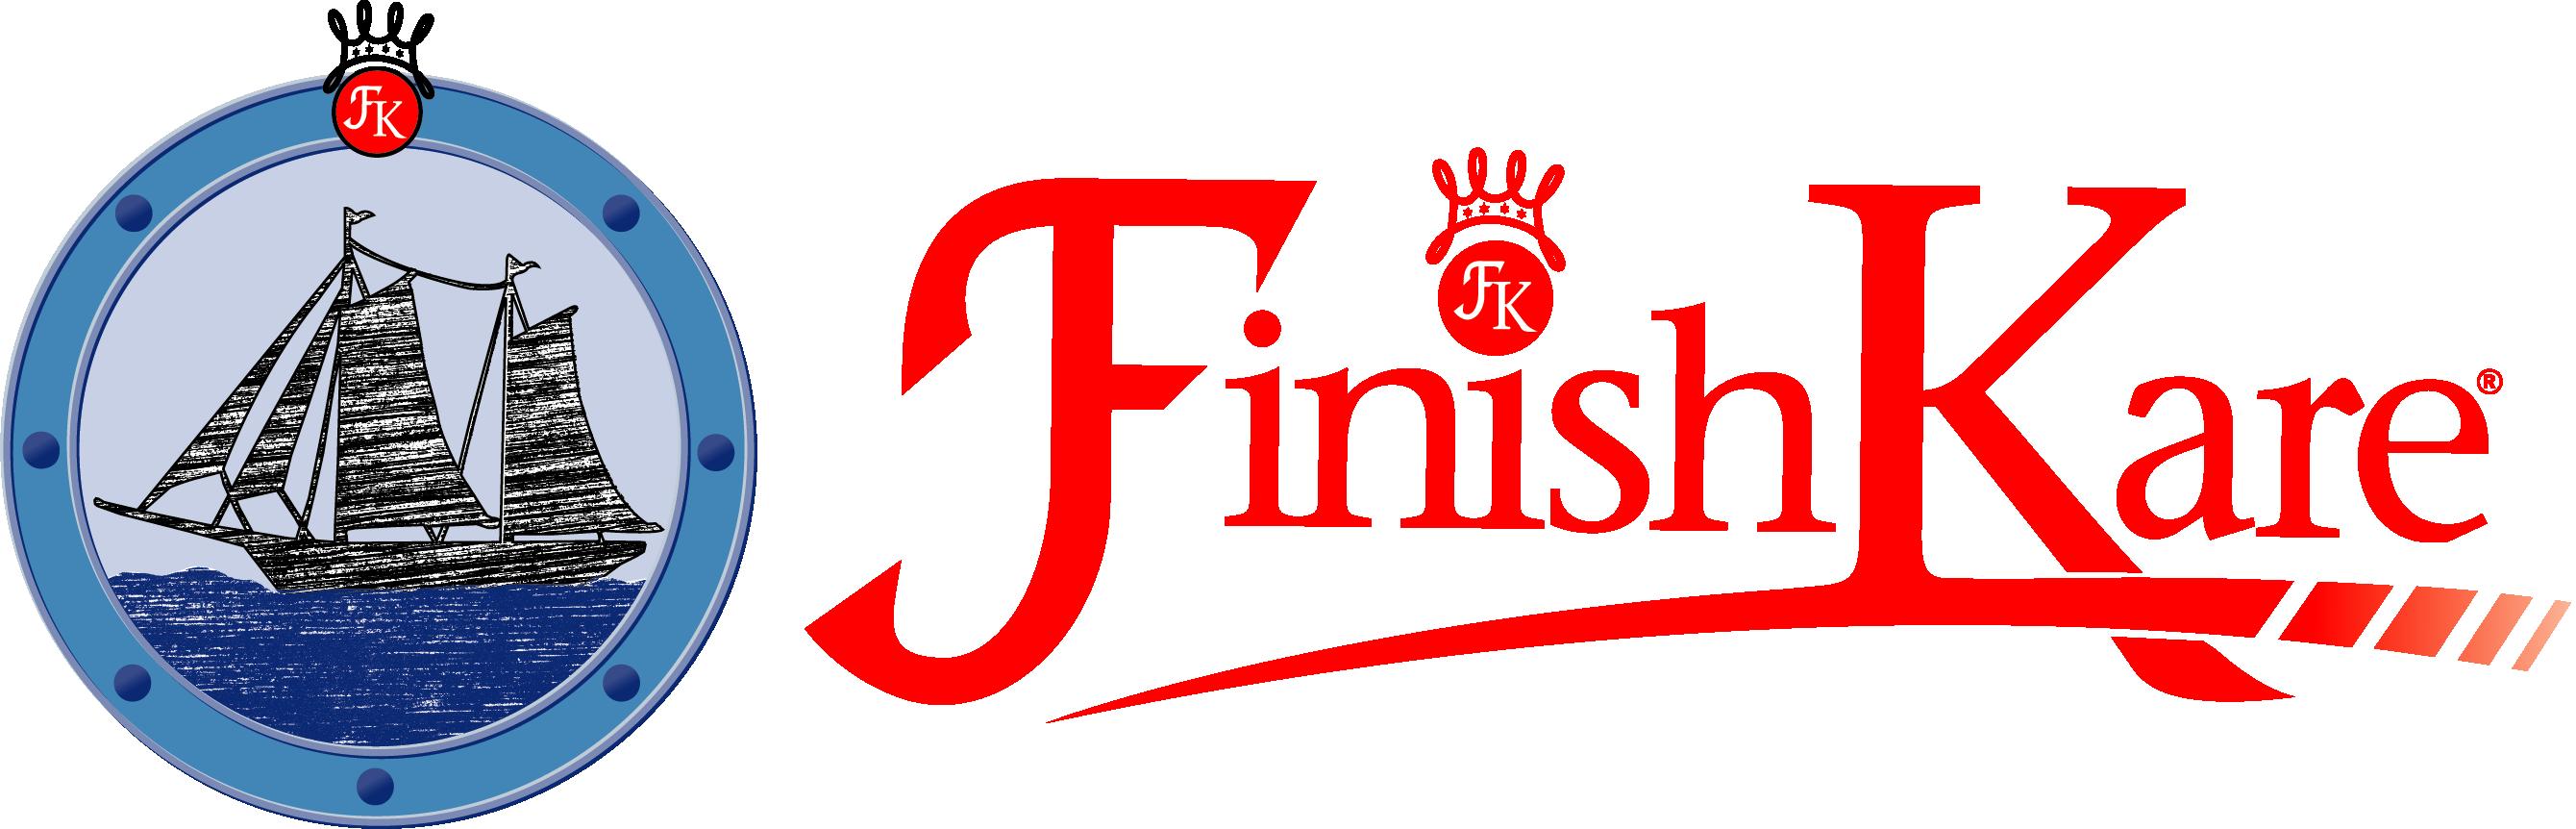 Made-in-California-manufacturer-Finish-Kare-Logo.png